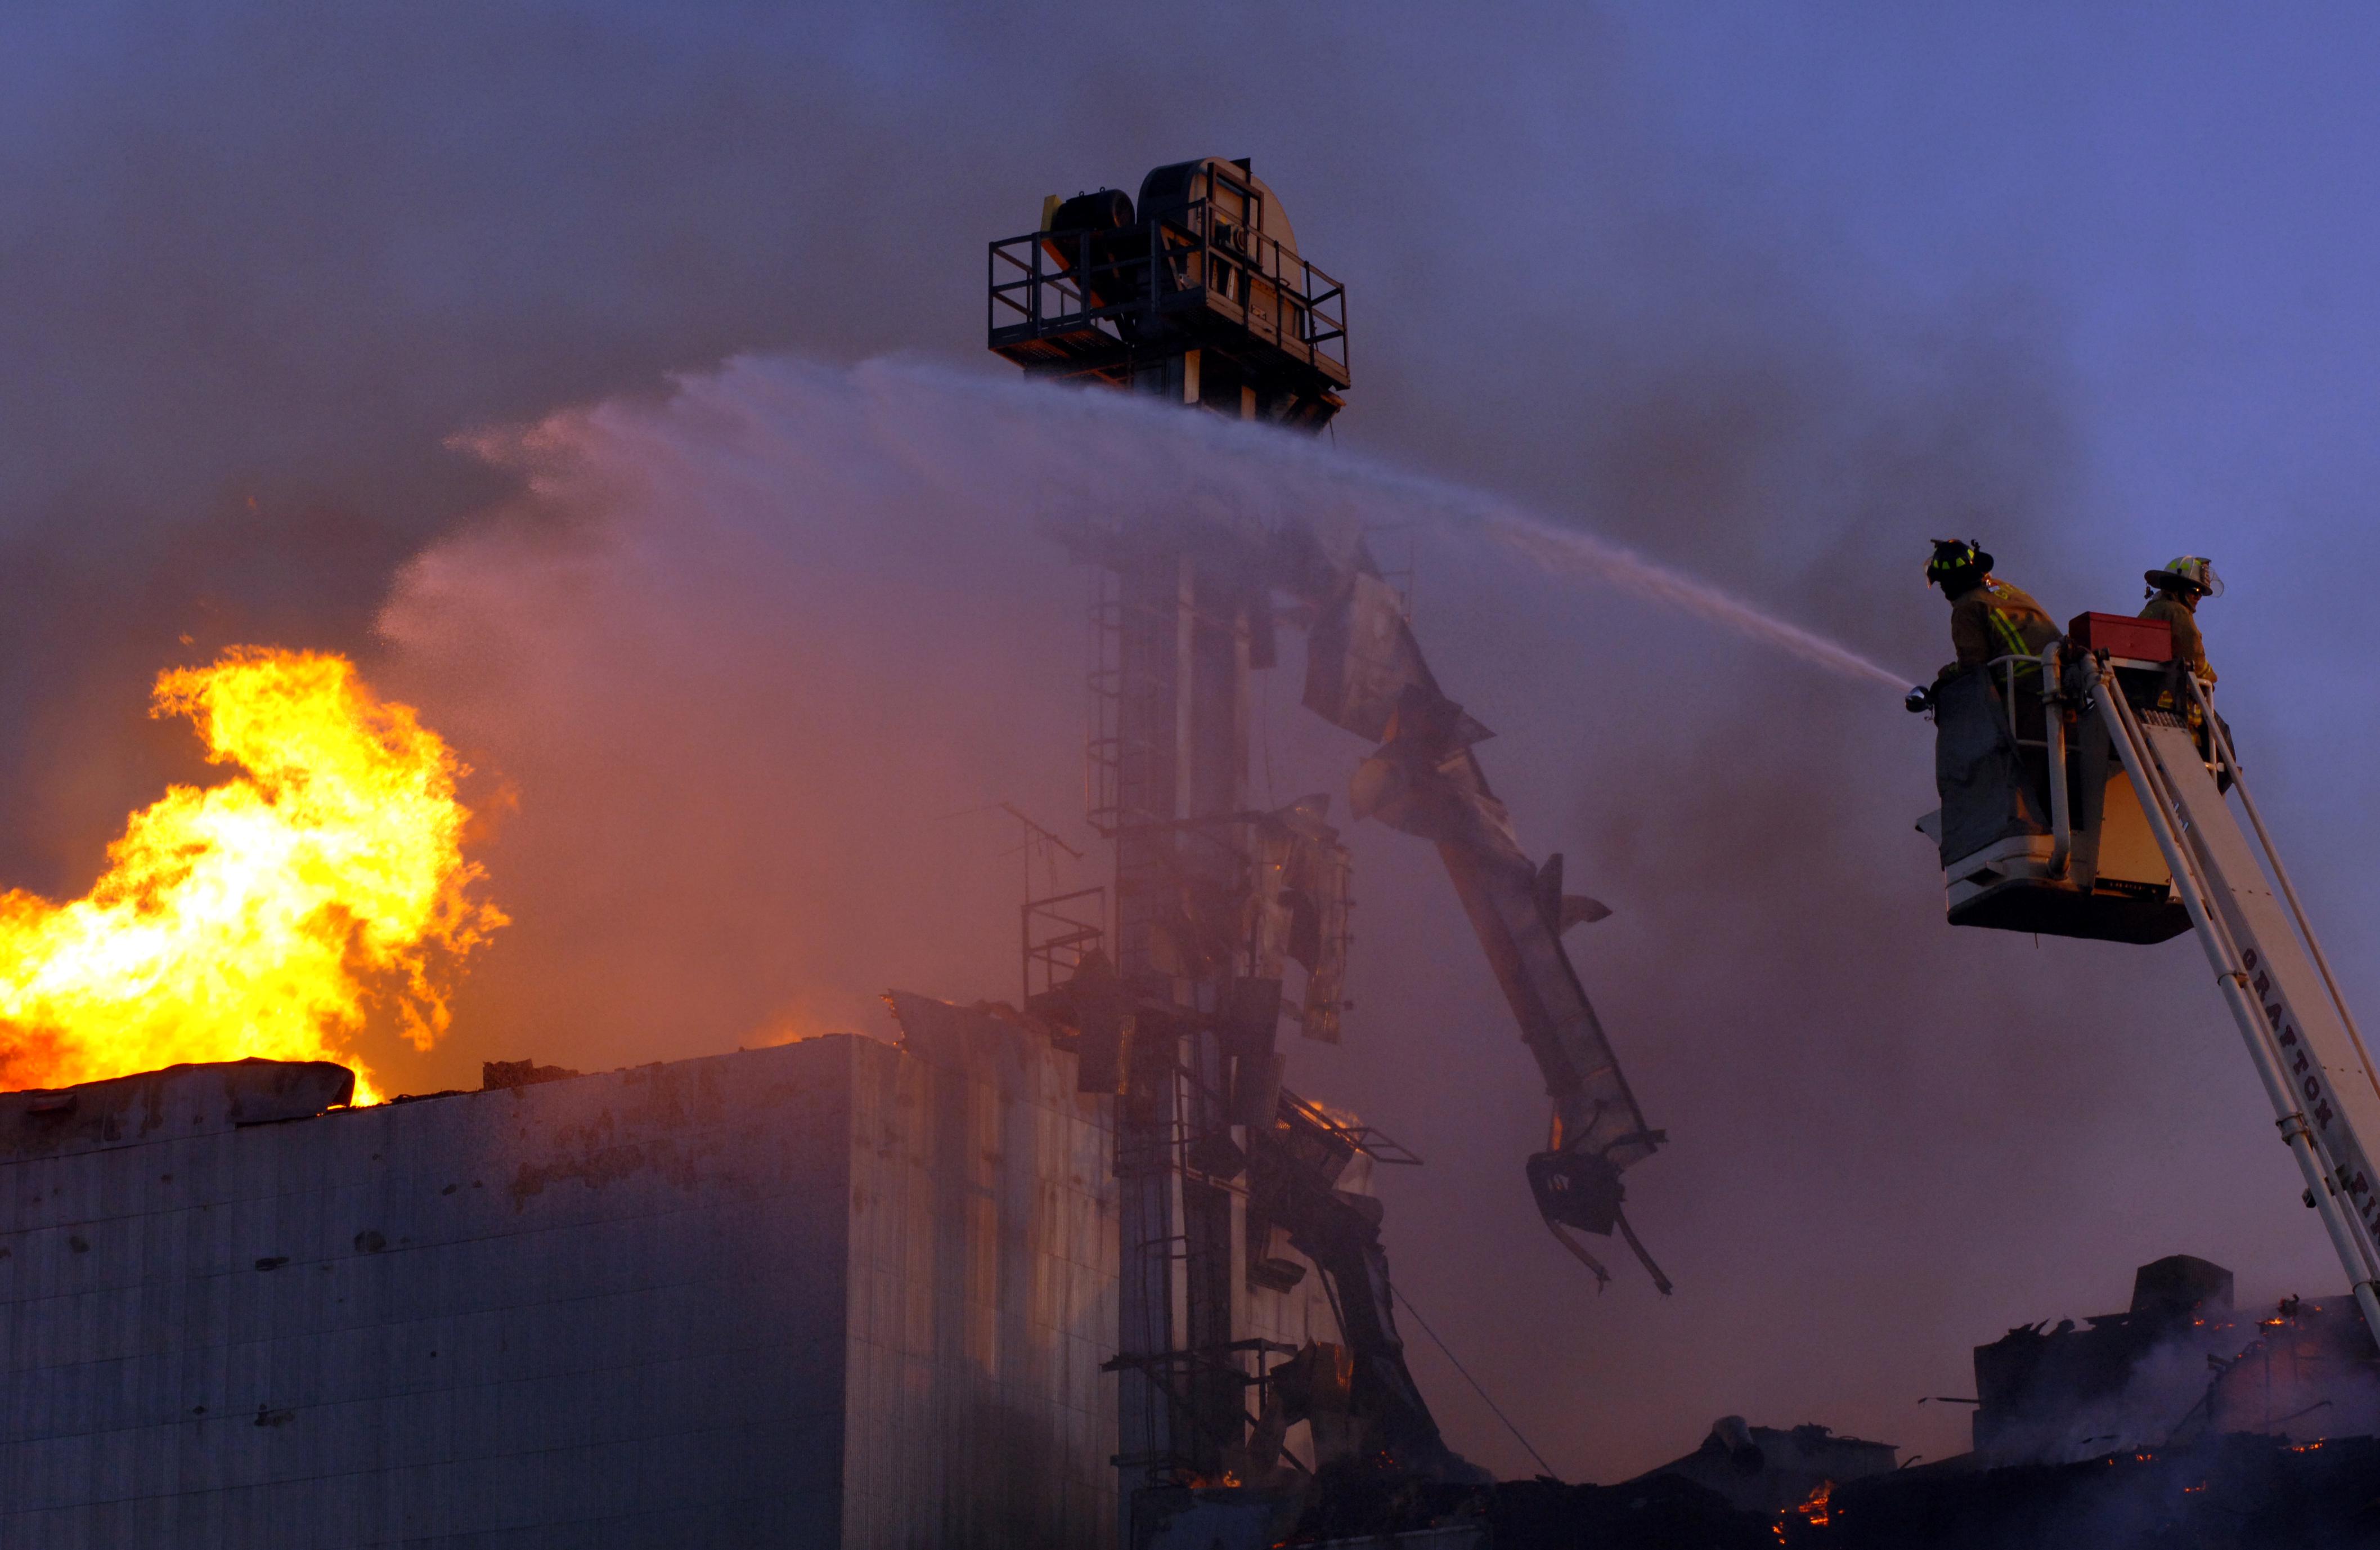 Grand forks firefighters help fight blaze air mobility command grand forks firefighters help fight blaze platinumwayz